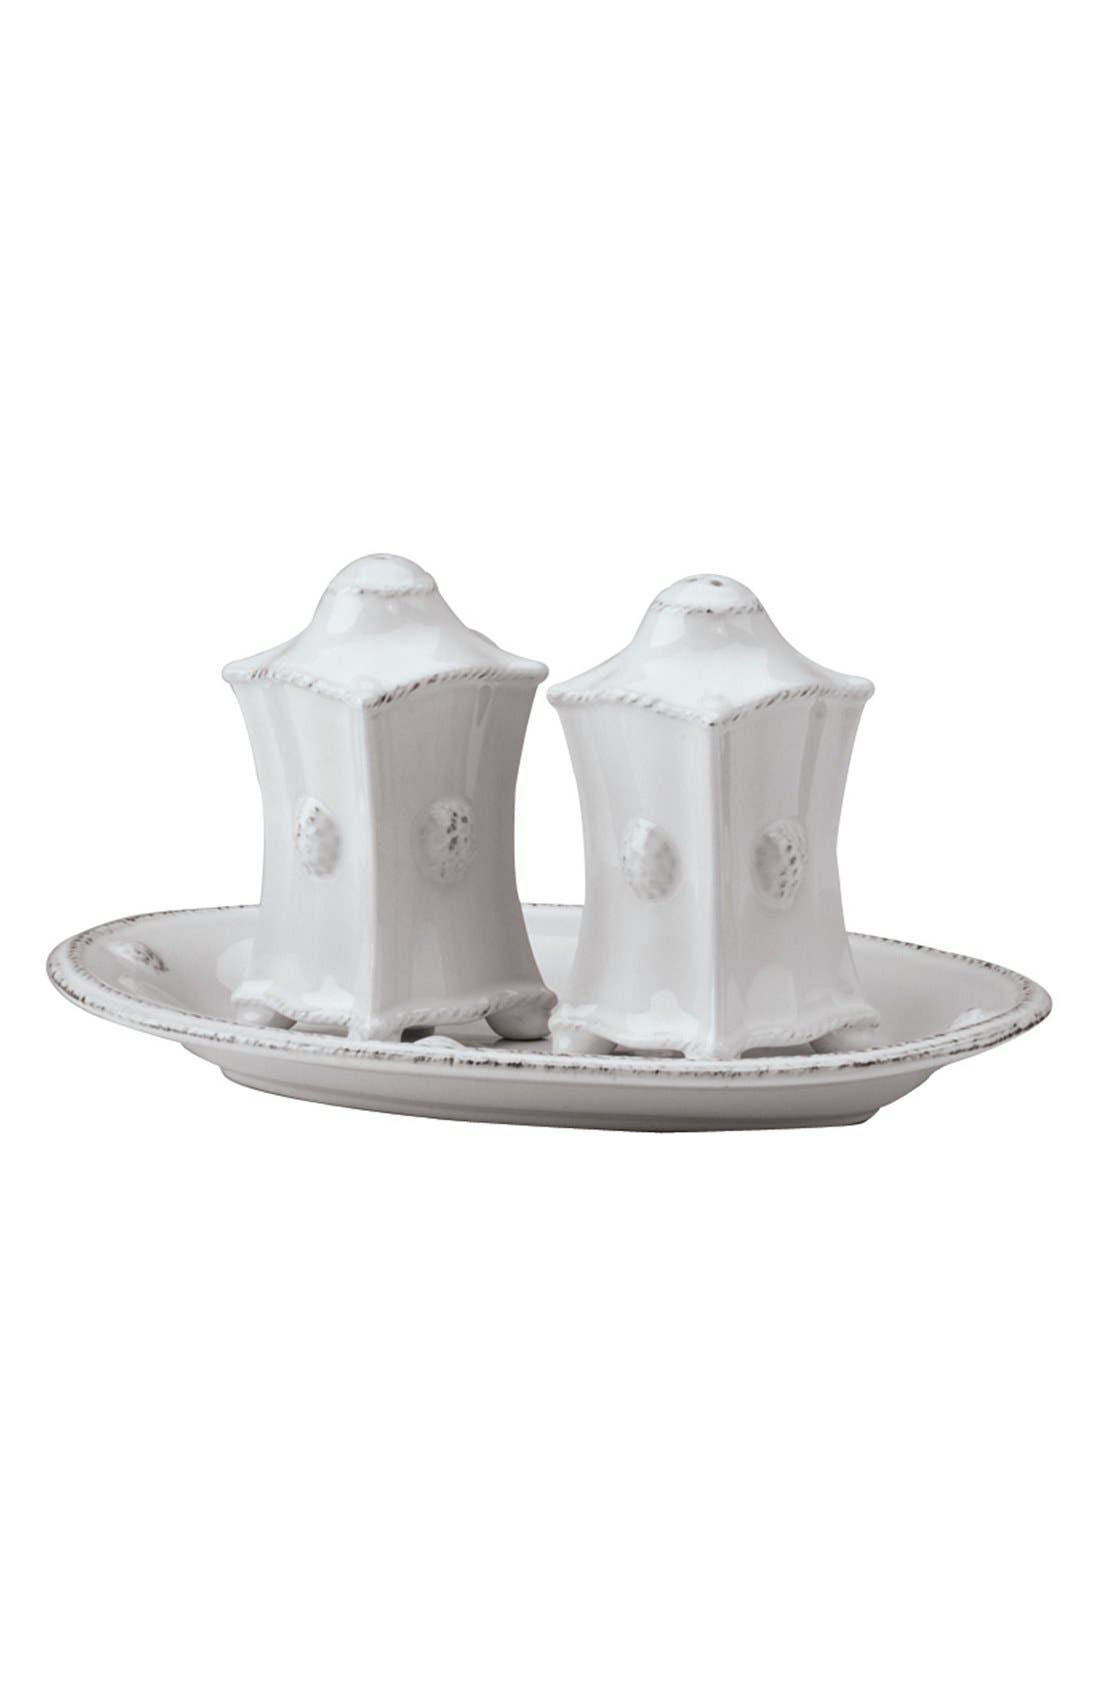 Juliska'Berry and Thread' CeramicSalt & Pepper Shakers